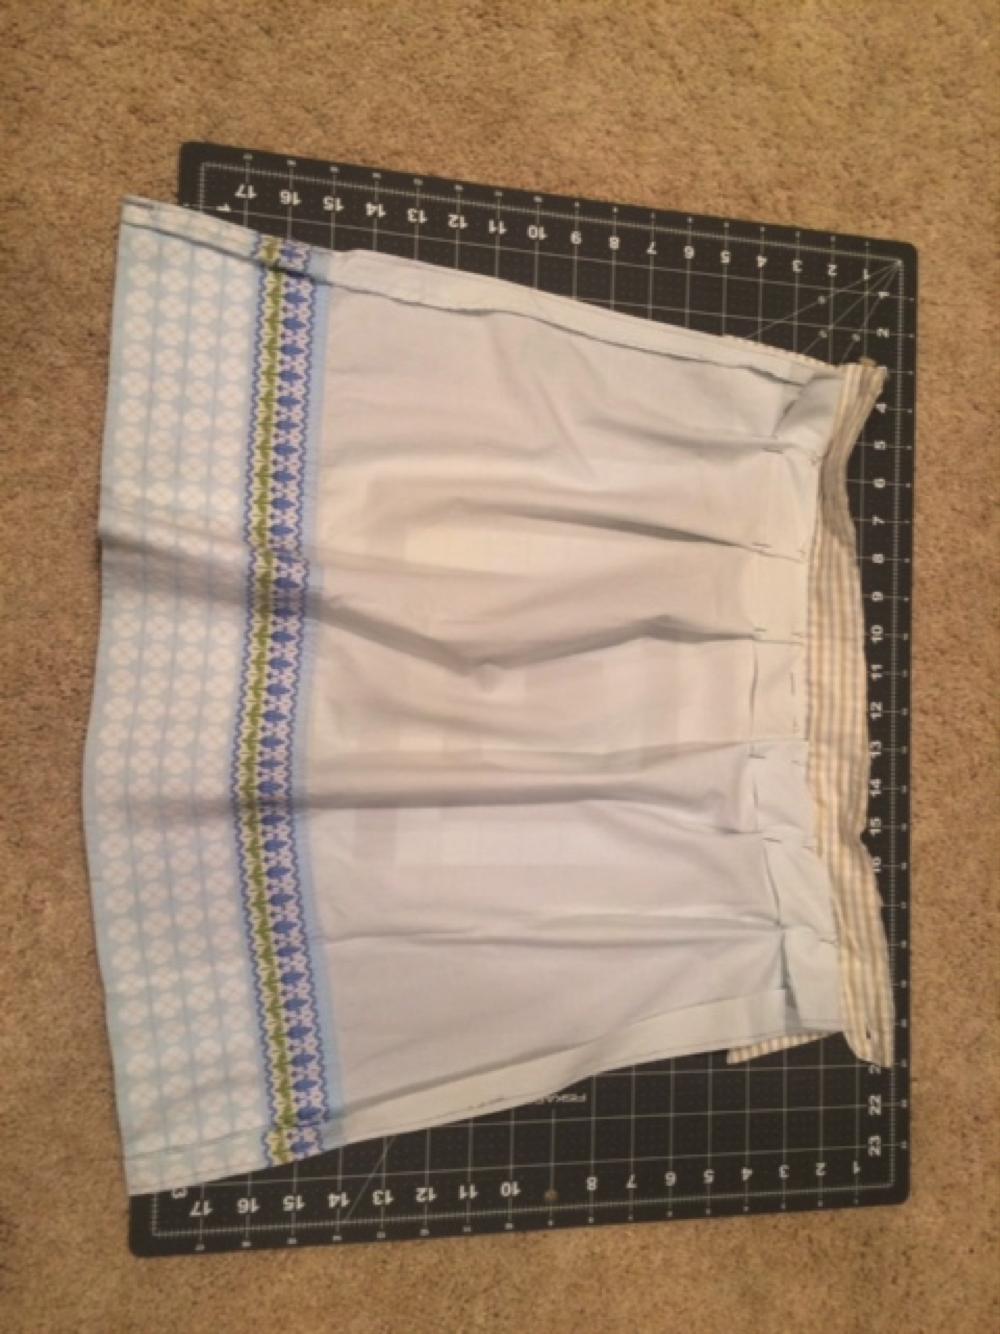 simple_sentimental_pillowcase_apron-3.jpeg